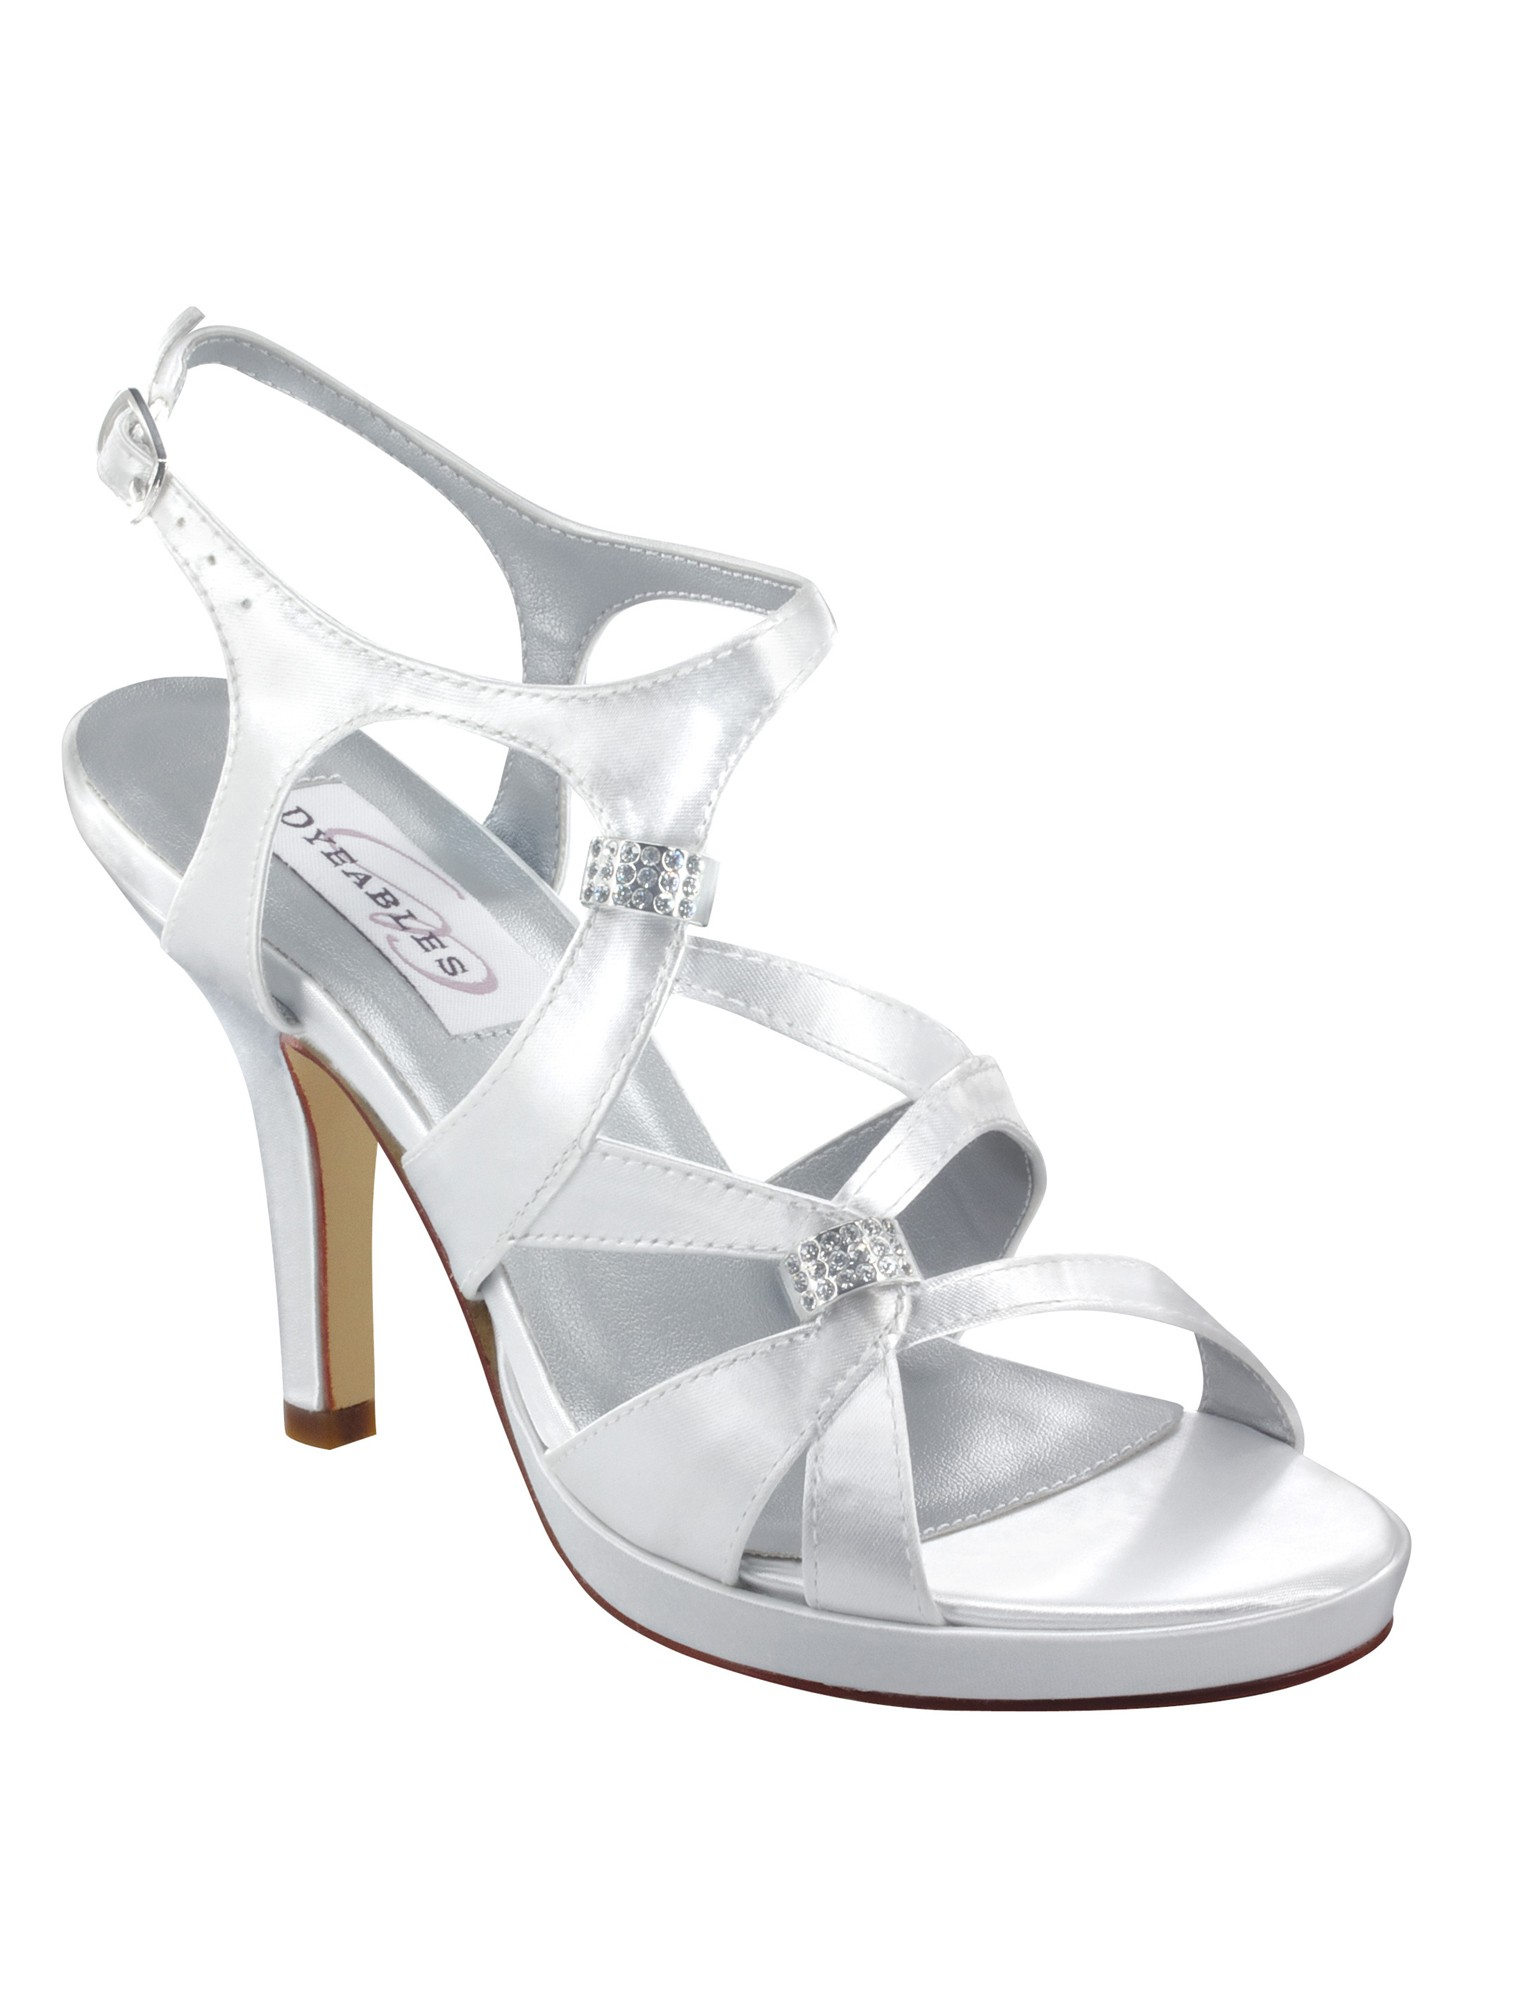 evening dress shoes wide width photo - 1